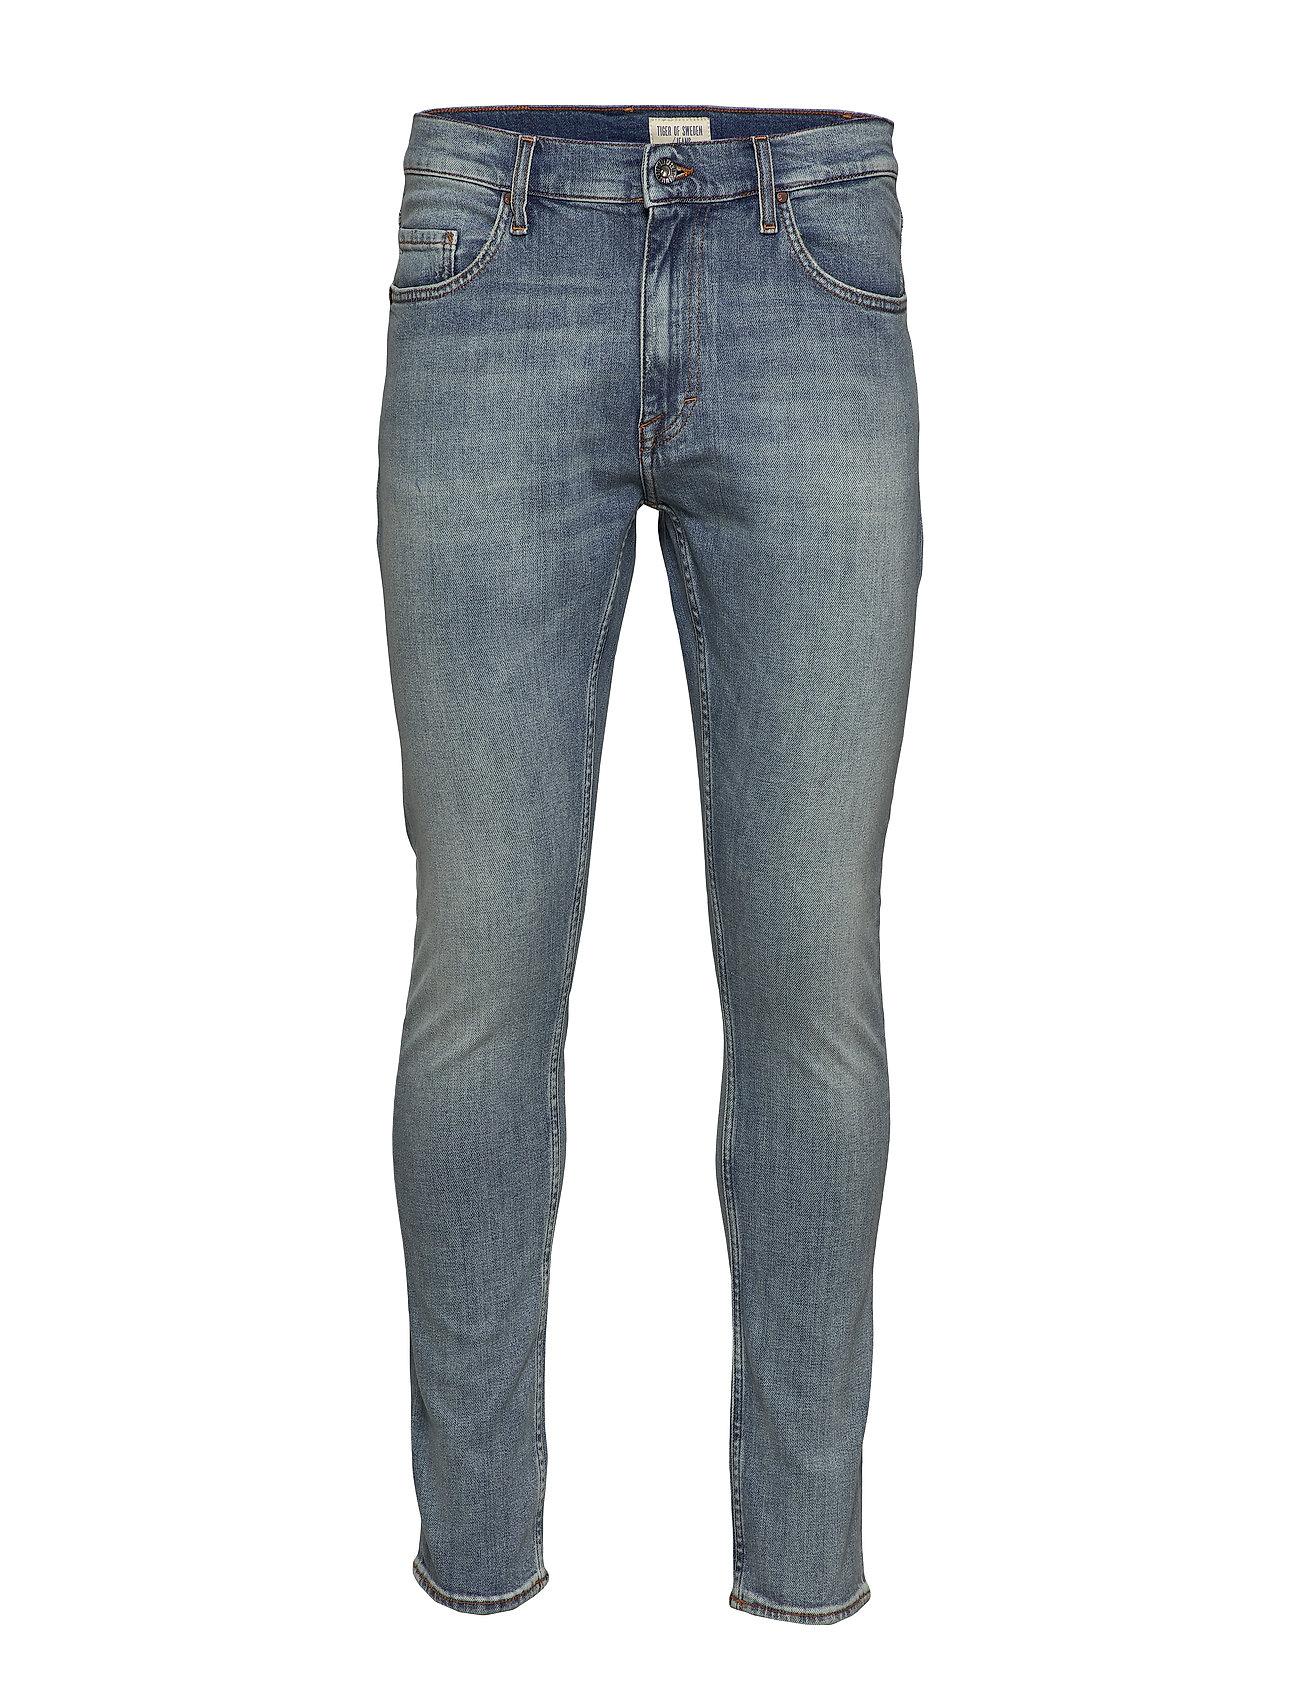 Tiger of Sweden Jeans PISTOLERO - LIGHT BLUE